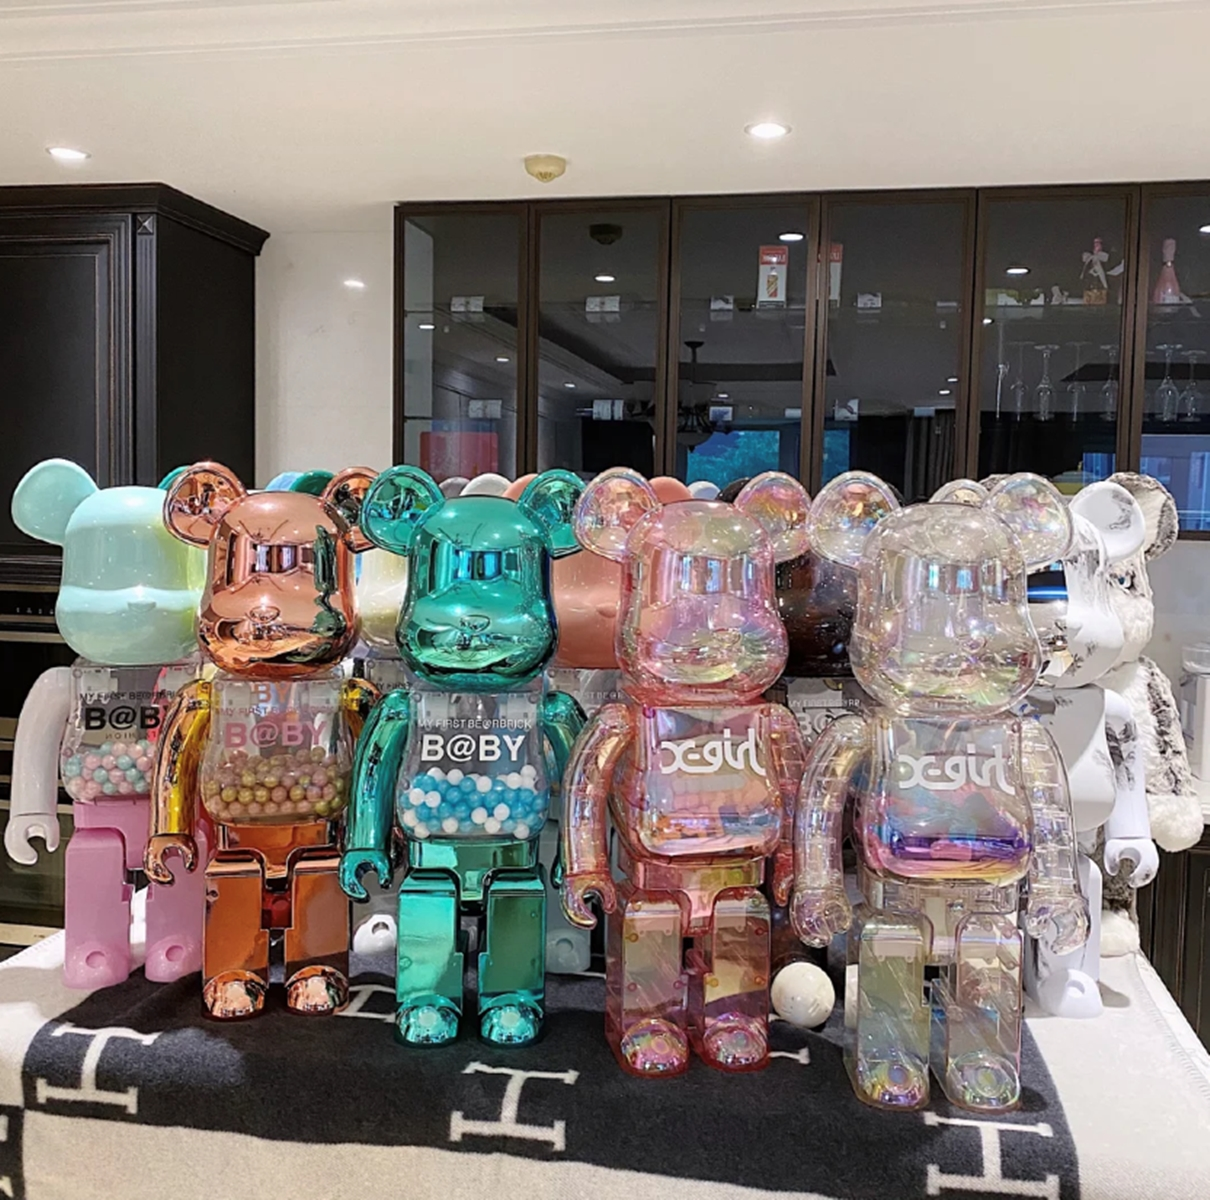 bearbrick violent bear building blocks Bear empty mountain base Qianqiu MMJ Ten million two tide brand doll hand do blind box